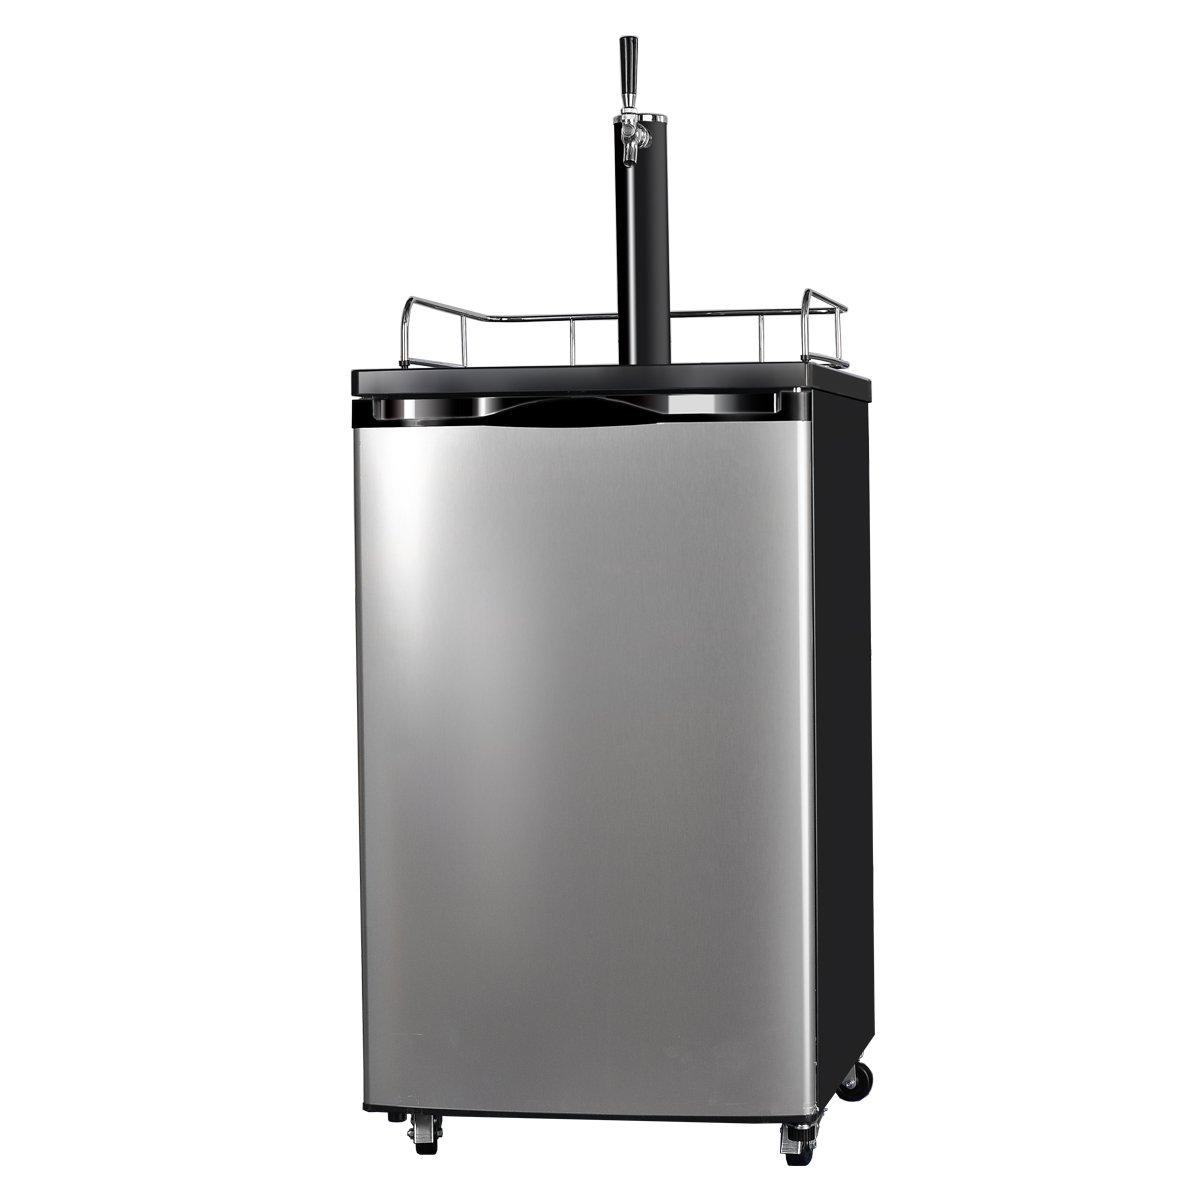 SMETA Freestanding Kegerator Draft Beer Dispenser with Beer tower Beer keg cooler refrigerator 4.9 cu ft,Stainless steel